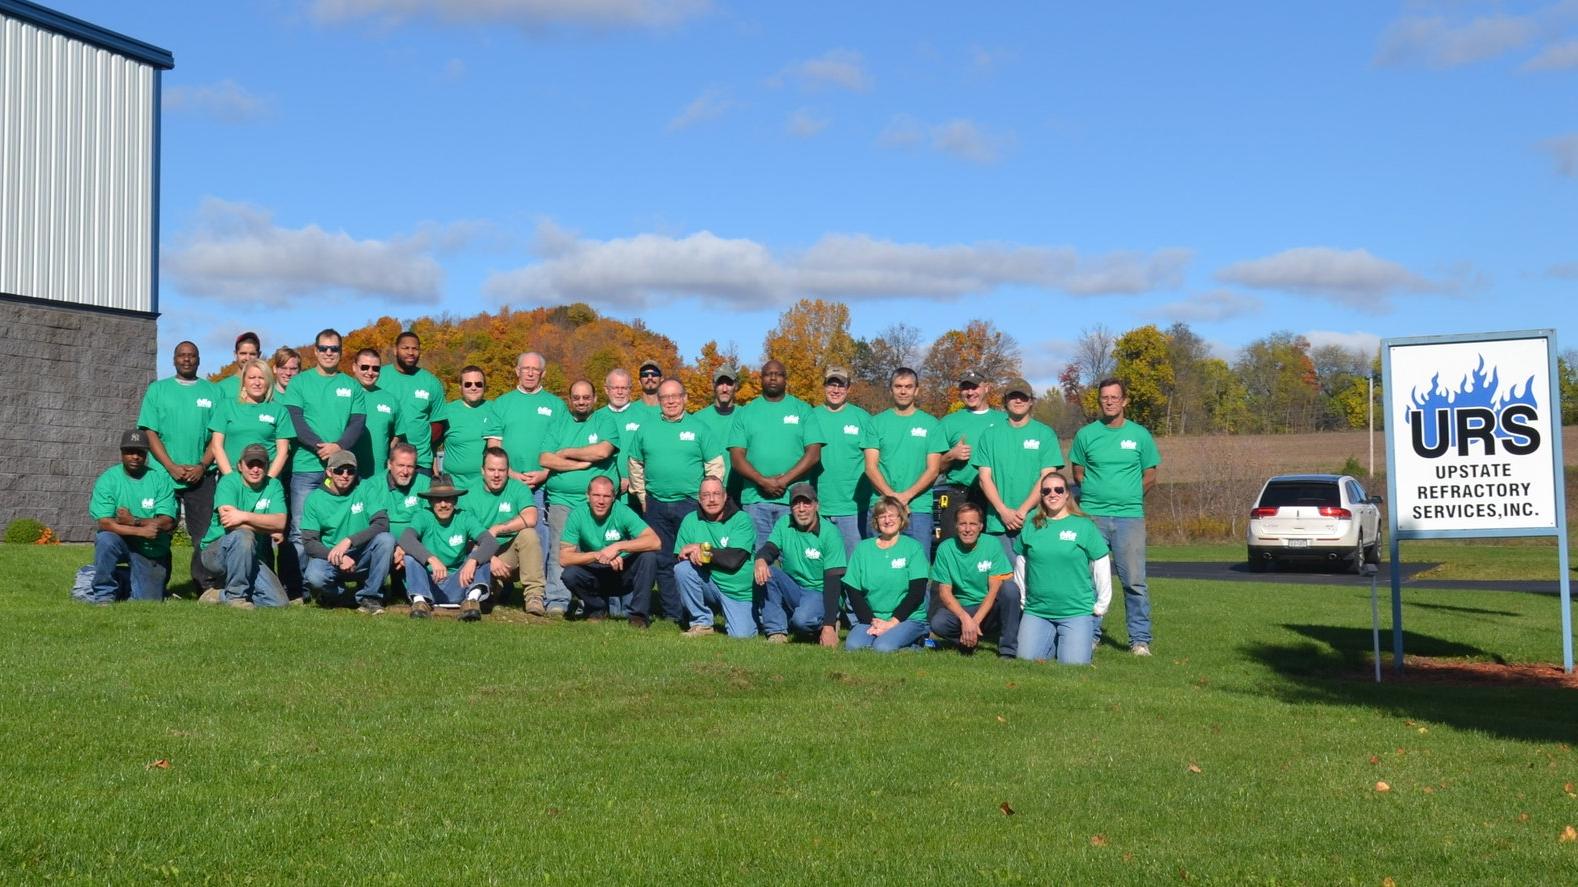 Employee Group Photo on Safety Day, November 2016